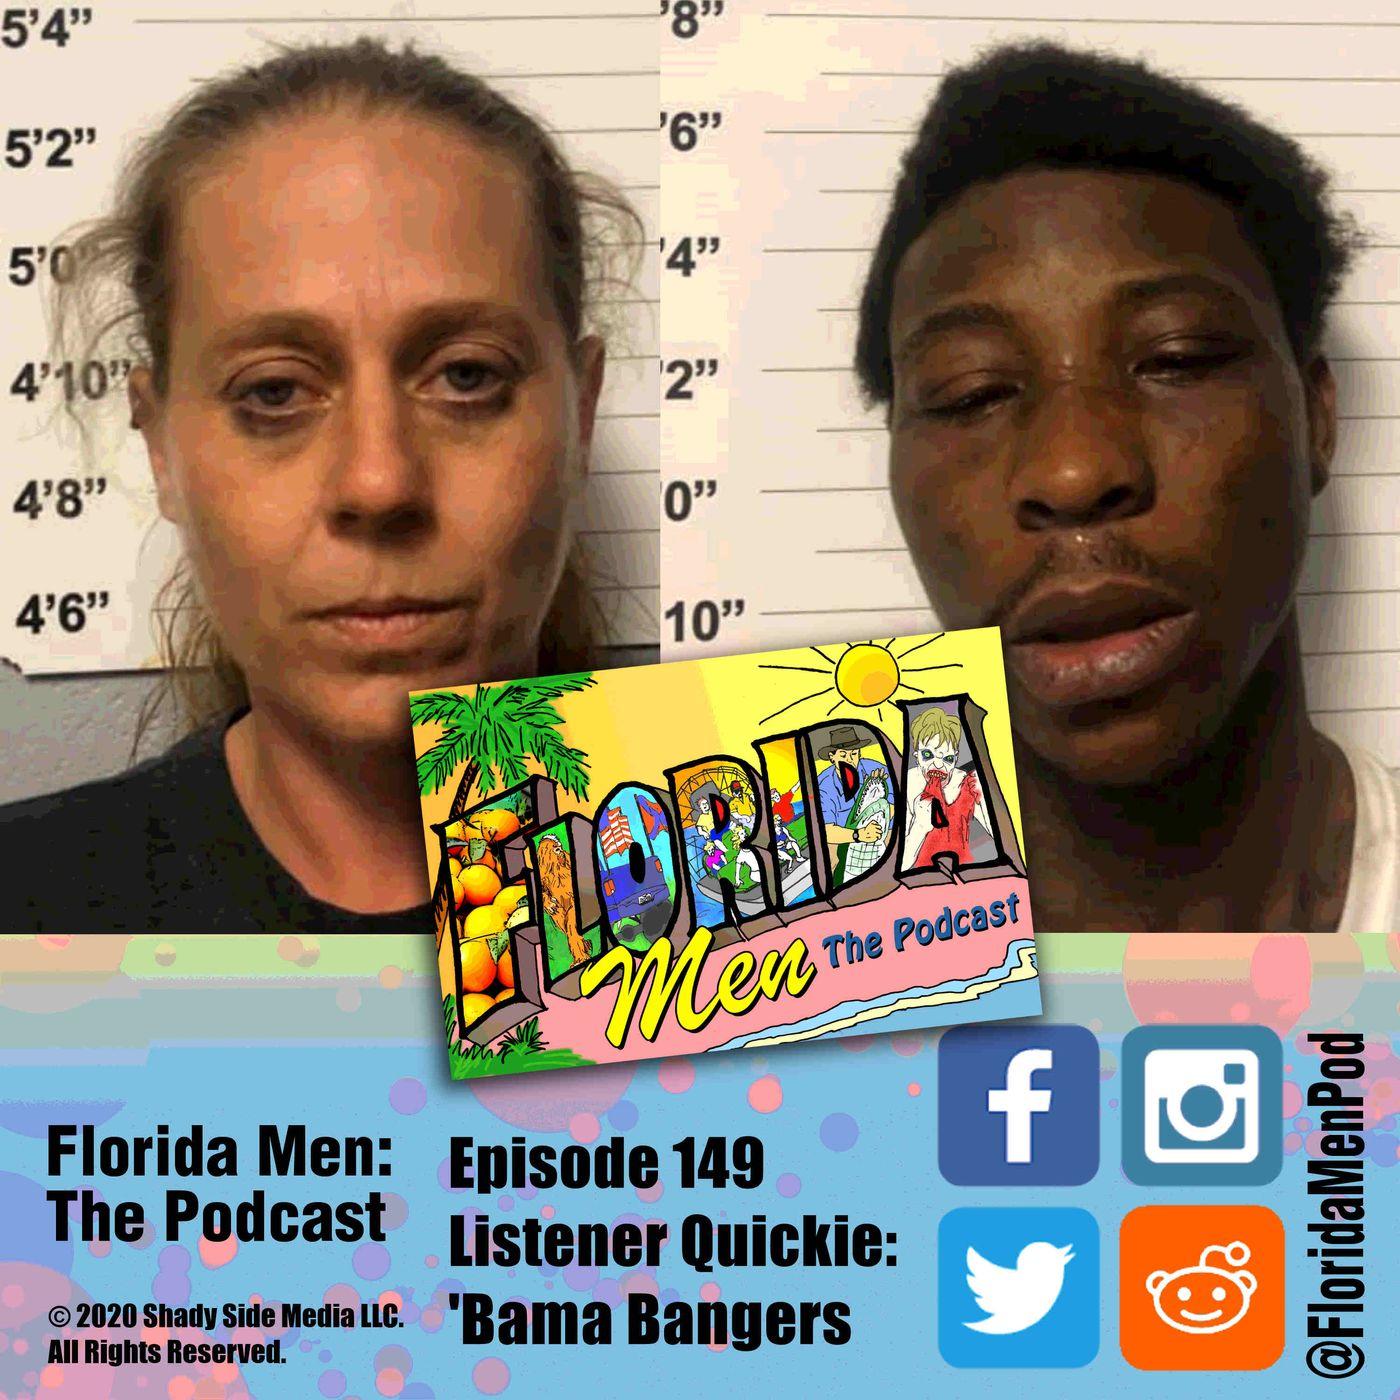 149 - Listener Quickie: 'Bama Bangers